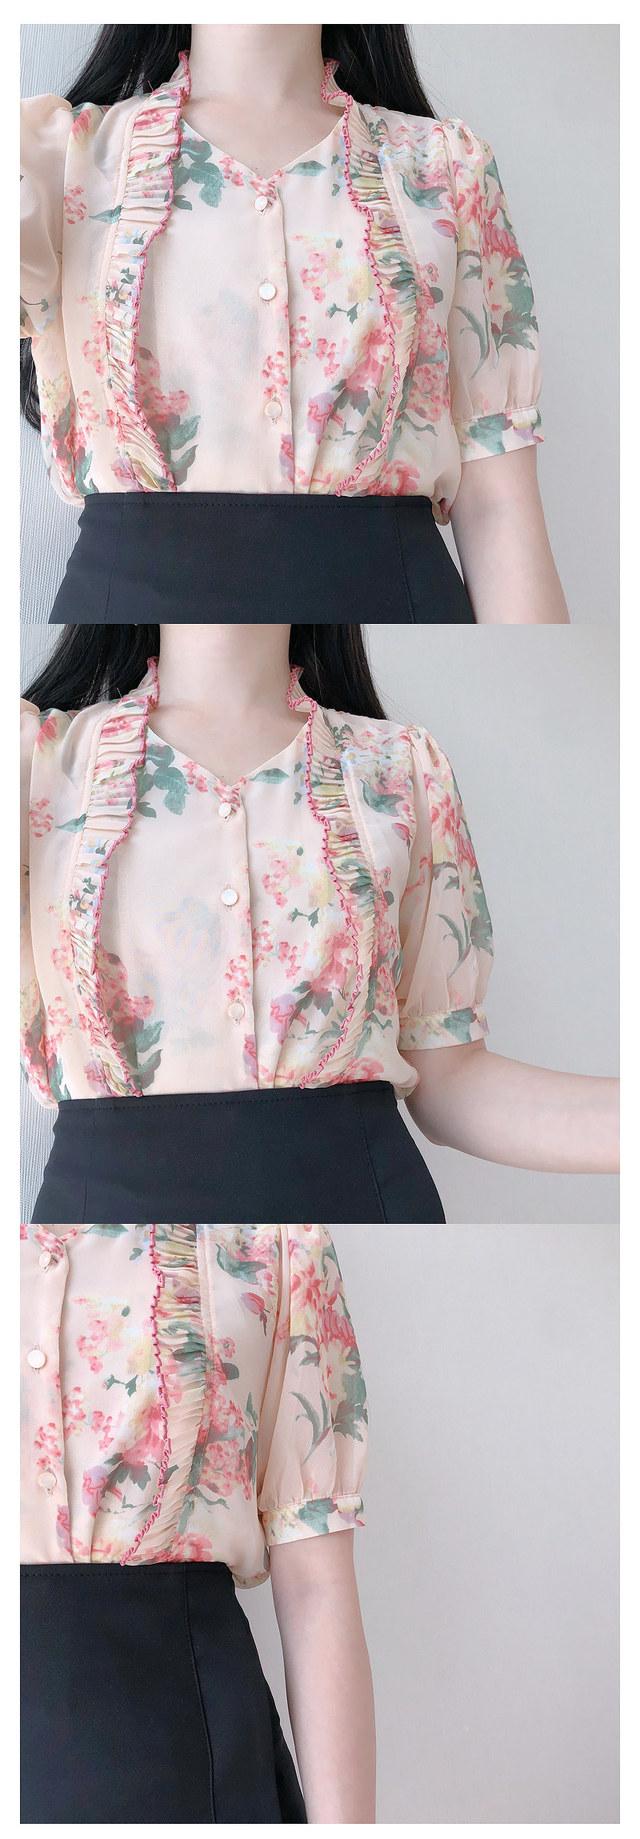 10% off the picture ♥ Elf flower bl (pink beige, navy)